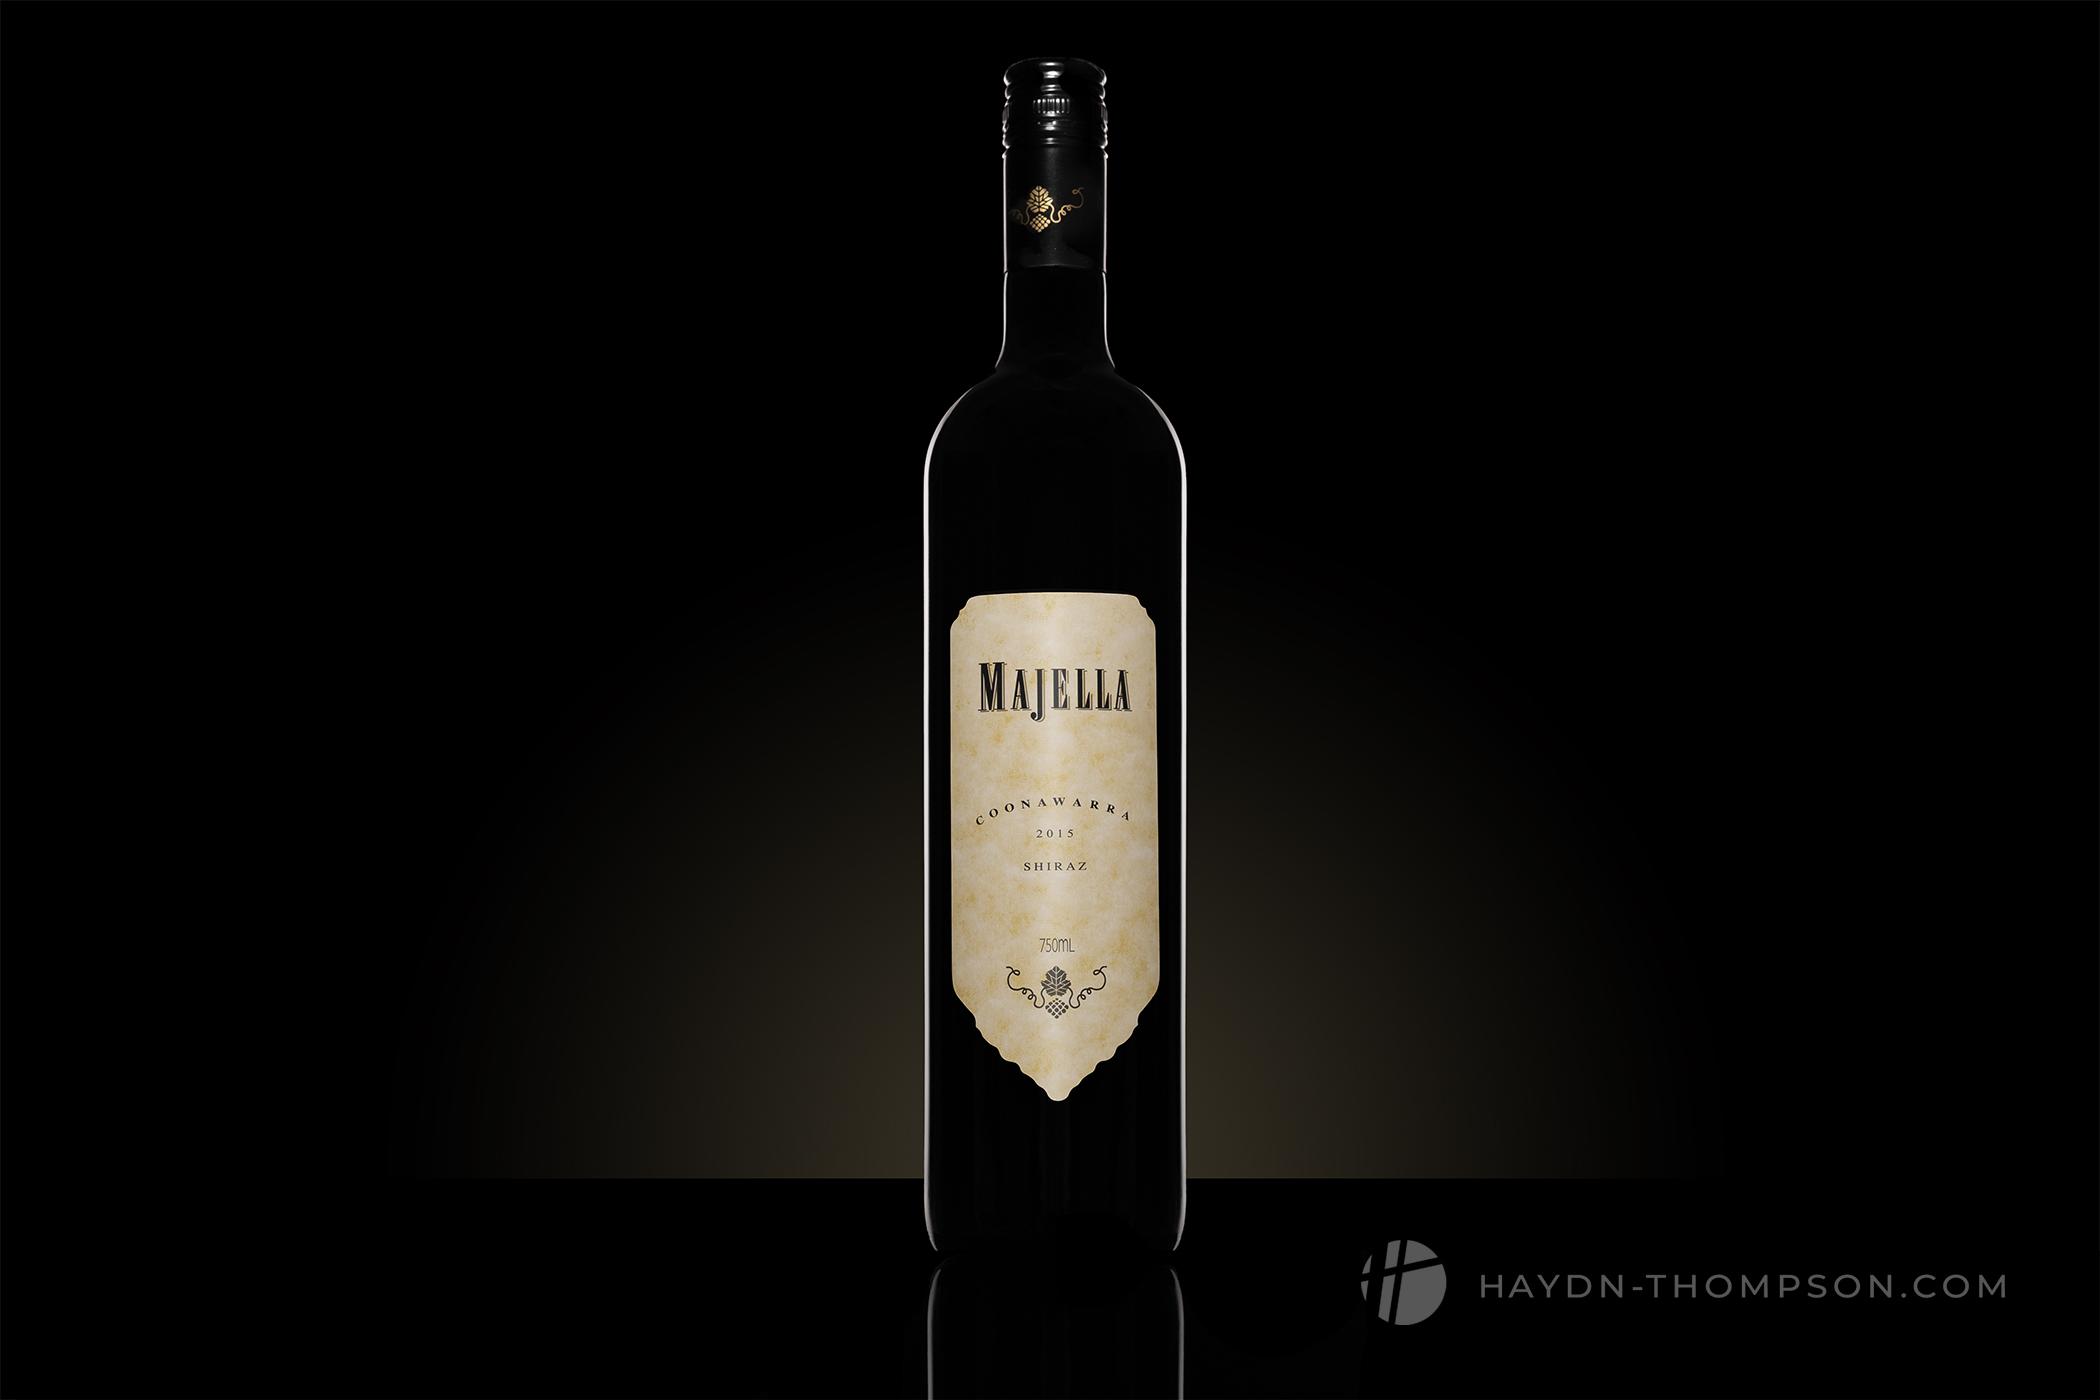 Majella Bottle (Dark with highlights) 4 (Small Size).jpg